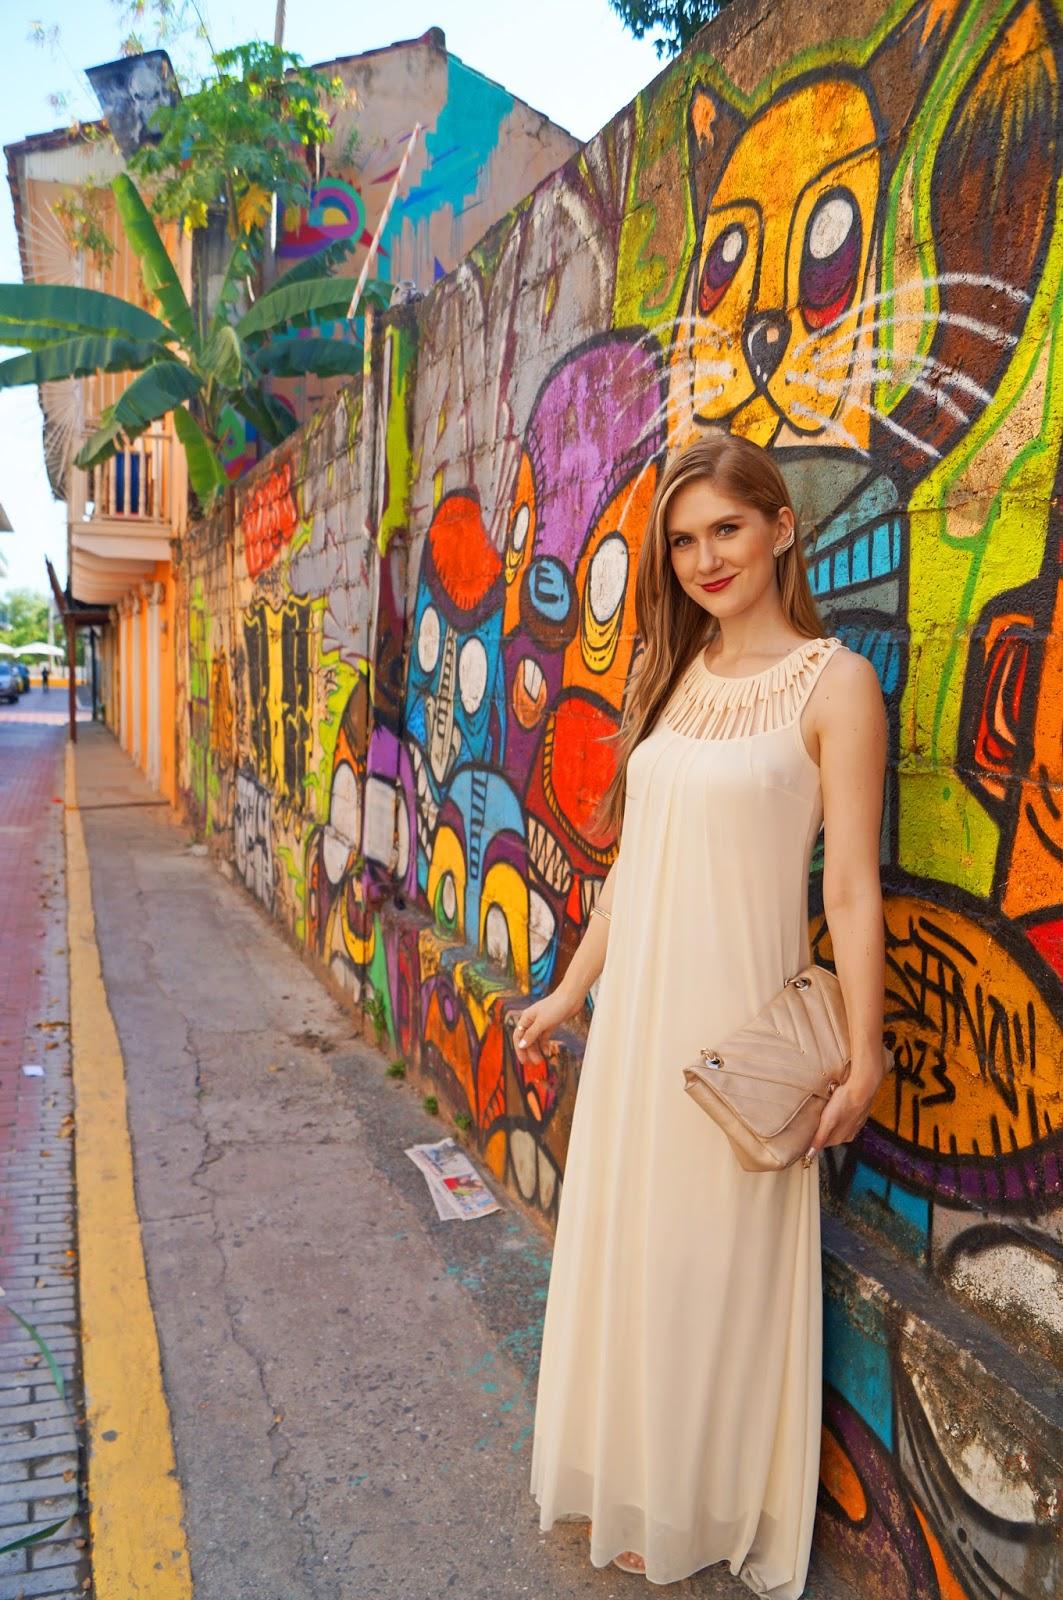 Graffiti at Casco Viejo, Panama